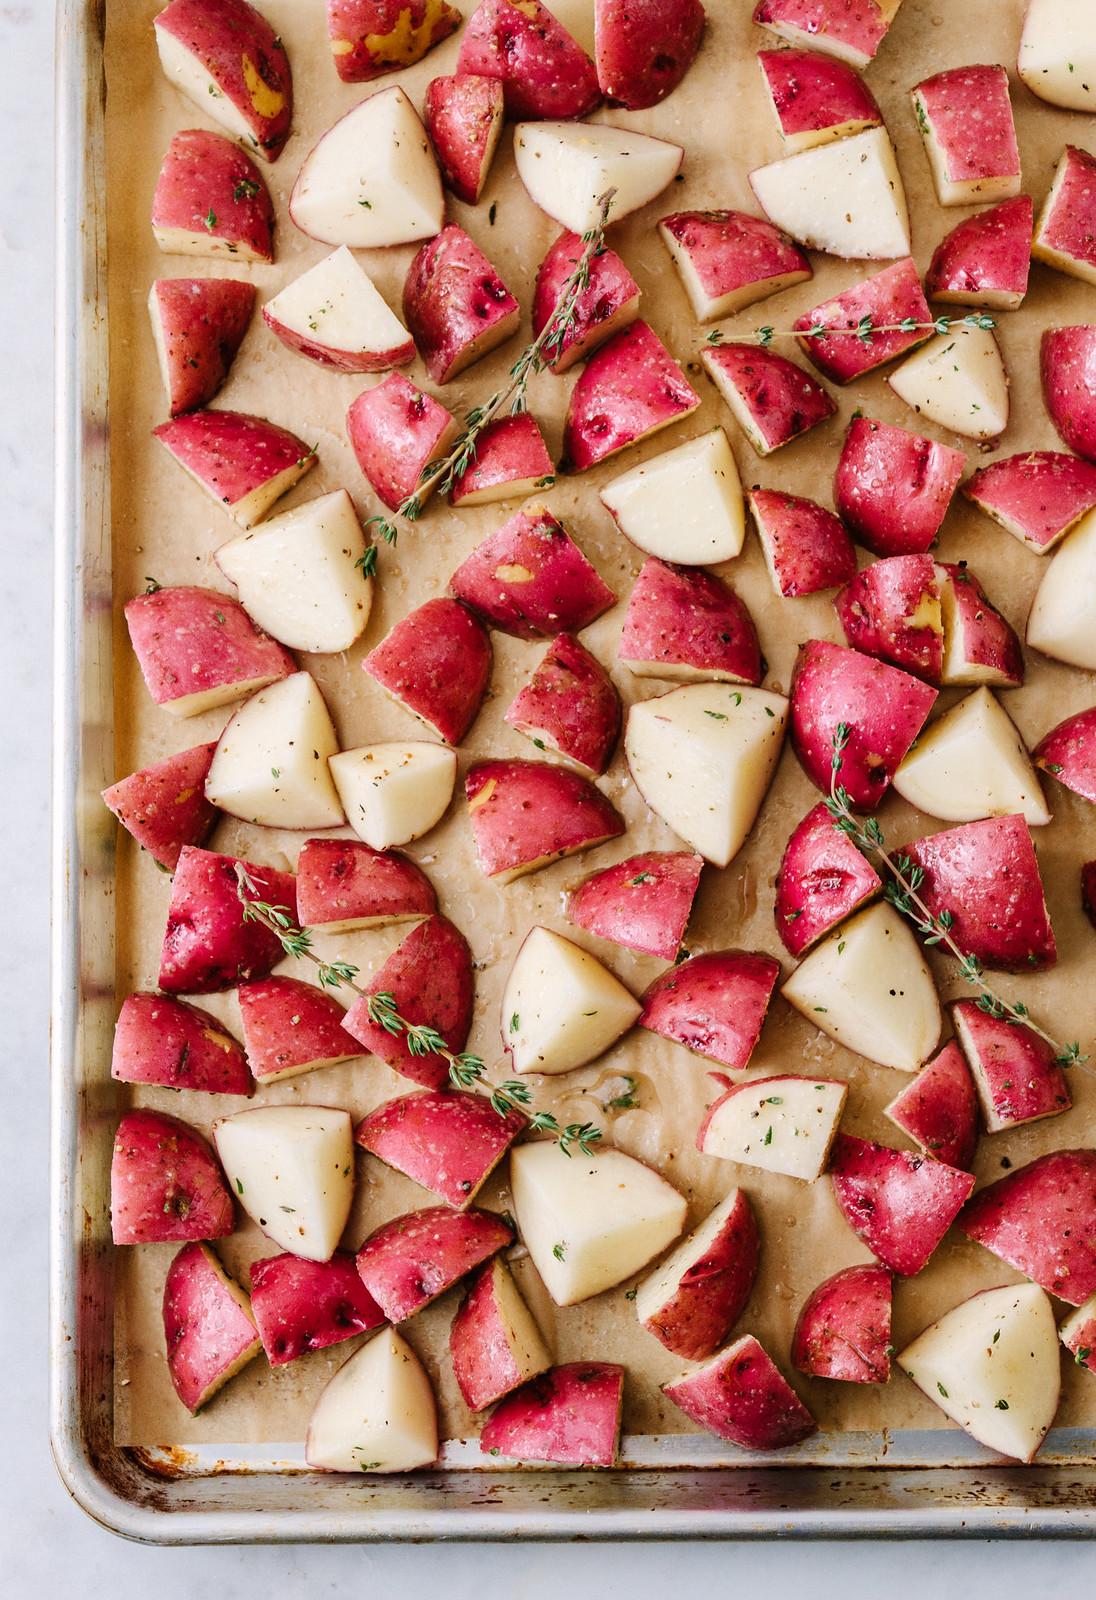 Roasted Red Potatoes on baking sheet